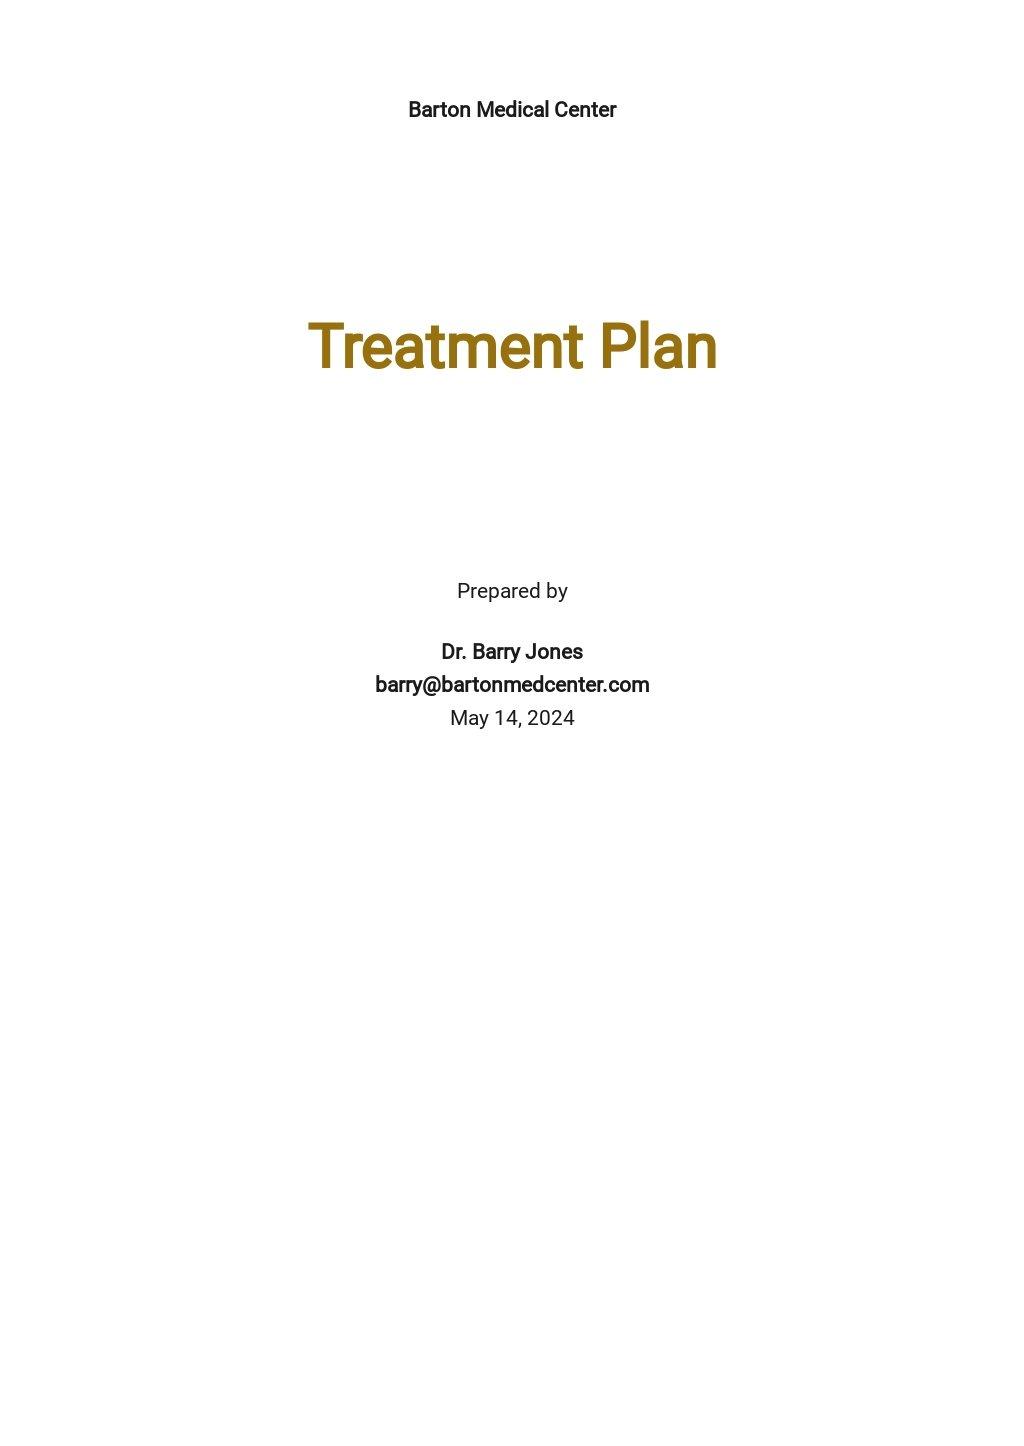 Sample Treatment Plan Template